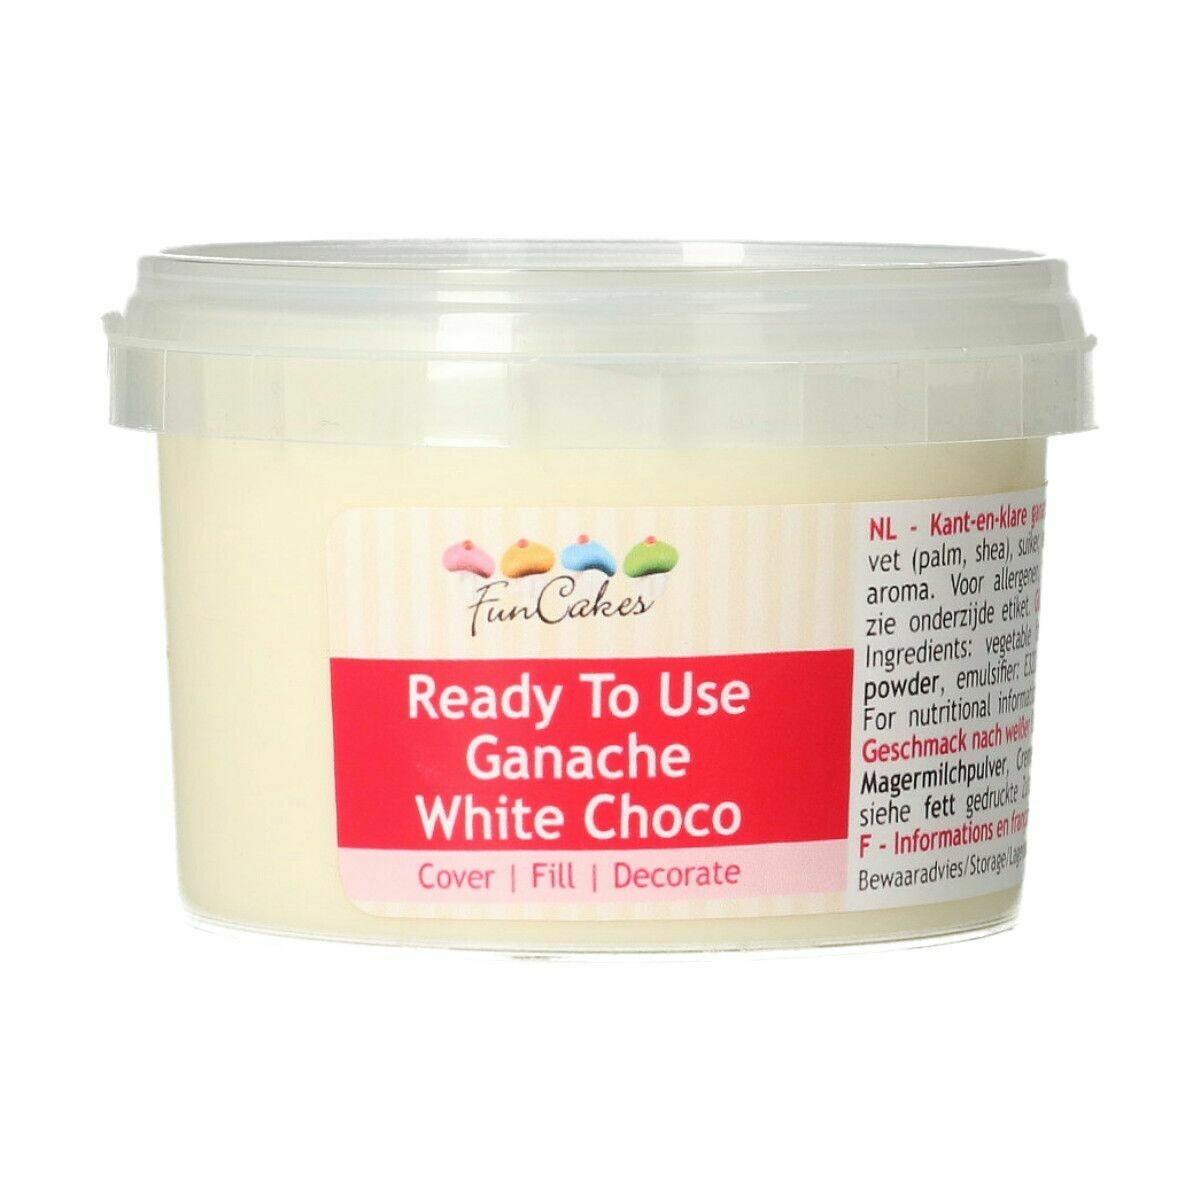 FunCakes Ready To Use Ganache -WHITE CHOCO 260g - Γκανάζ λευκής σοκολάτας